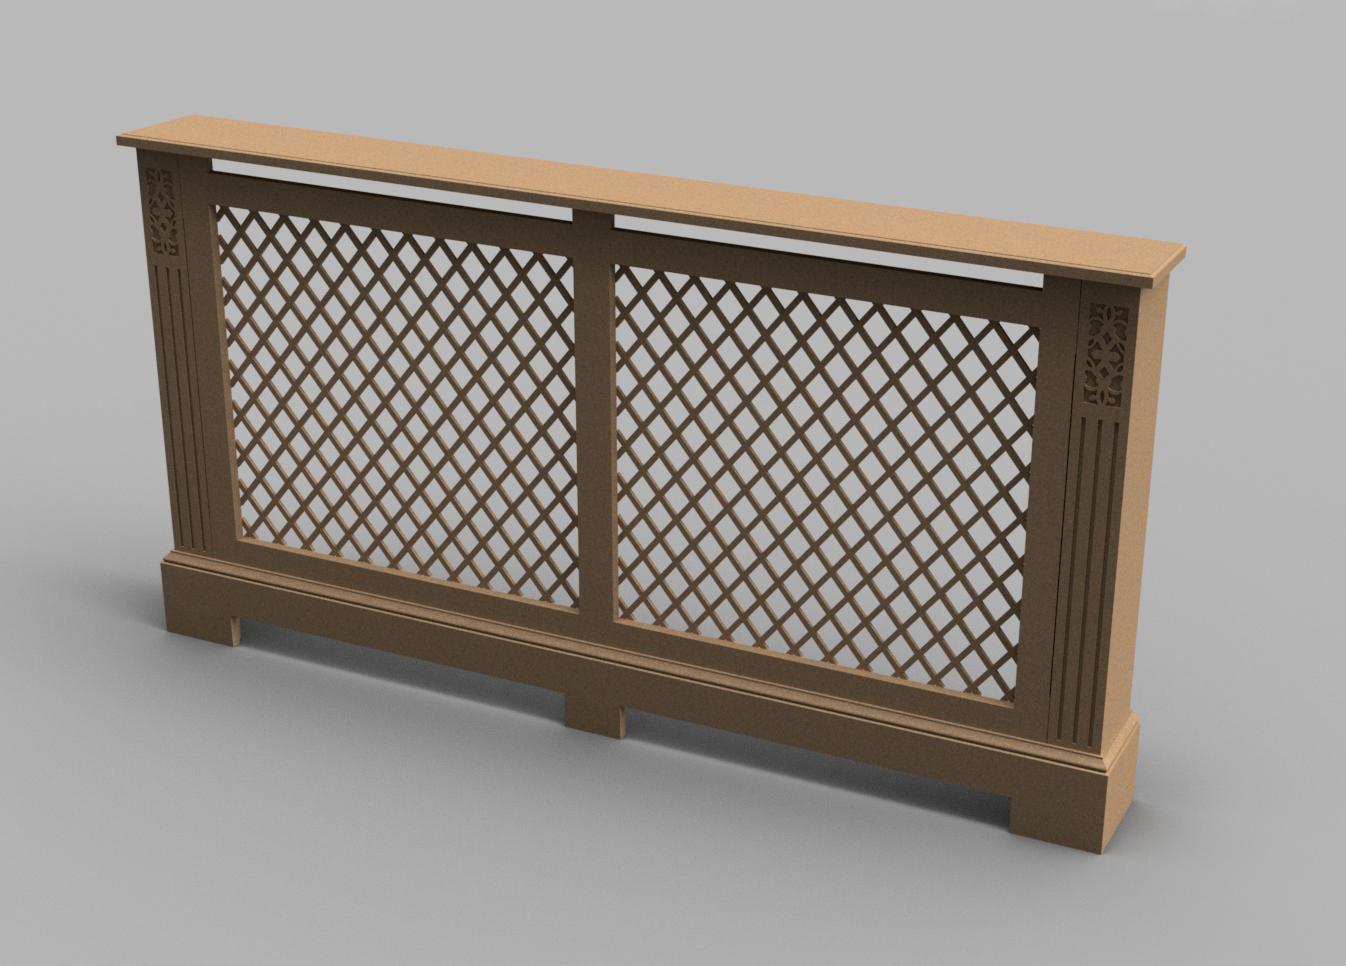 radiator cover 7